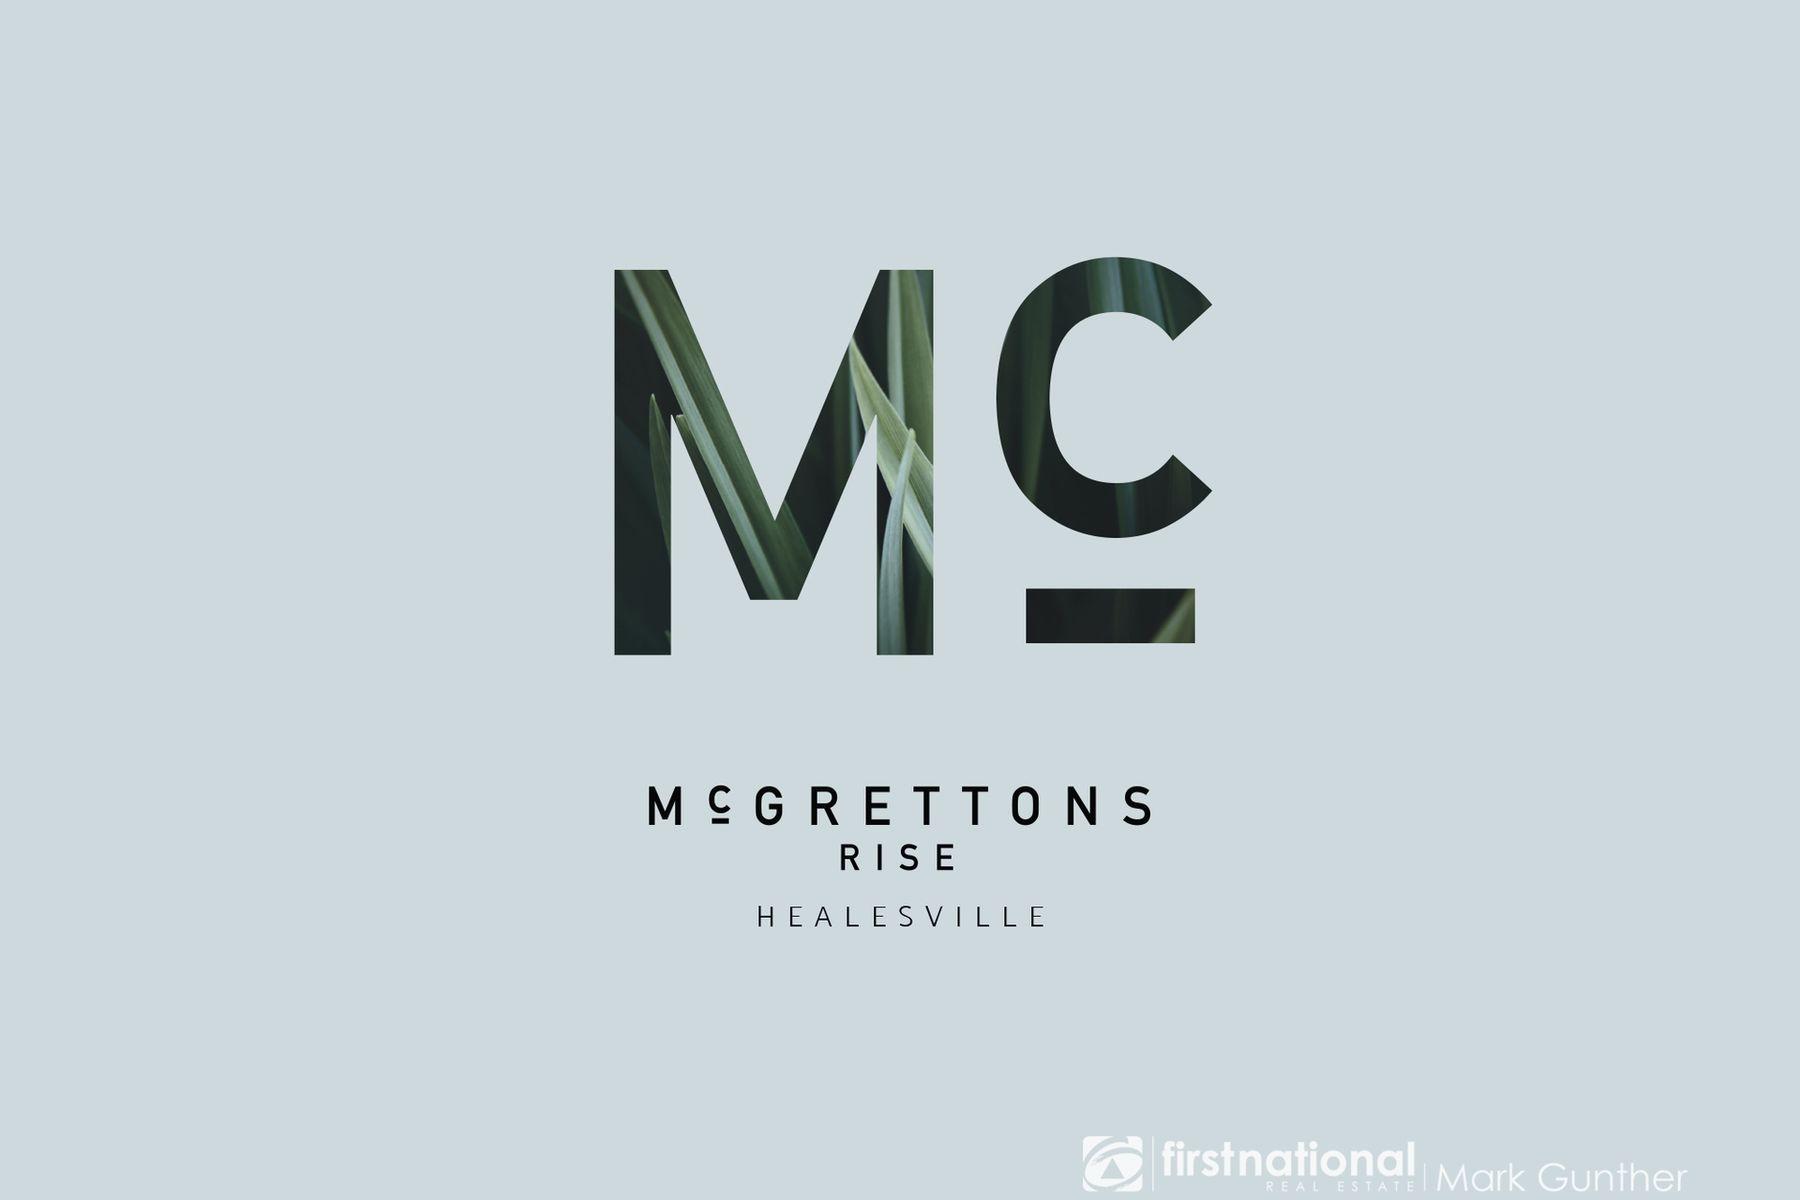 Lot 15/29 Mcgrettons Road, Healesville, VIC 3777